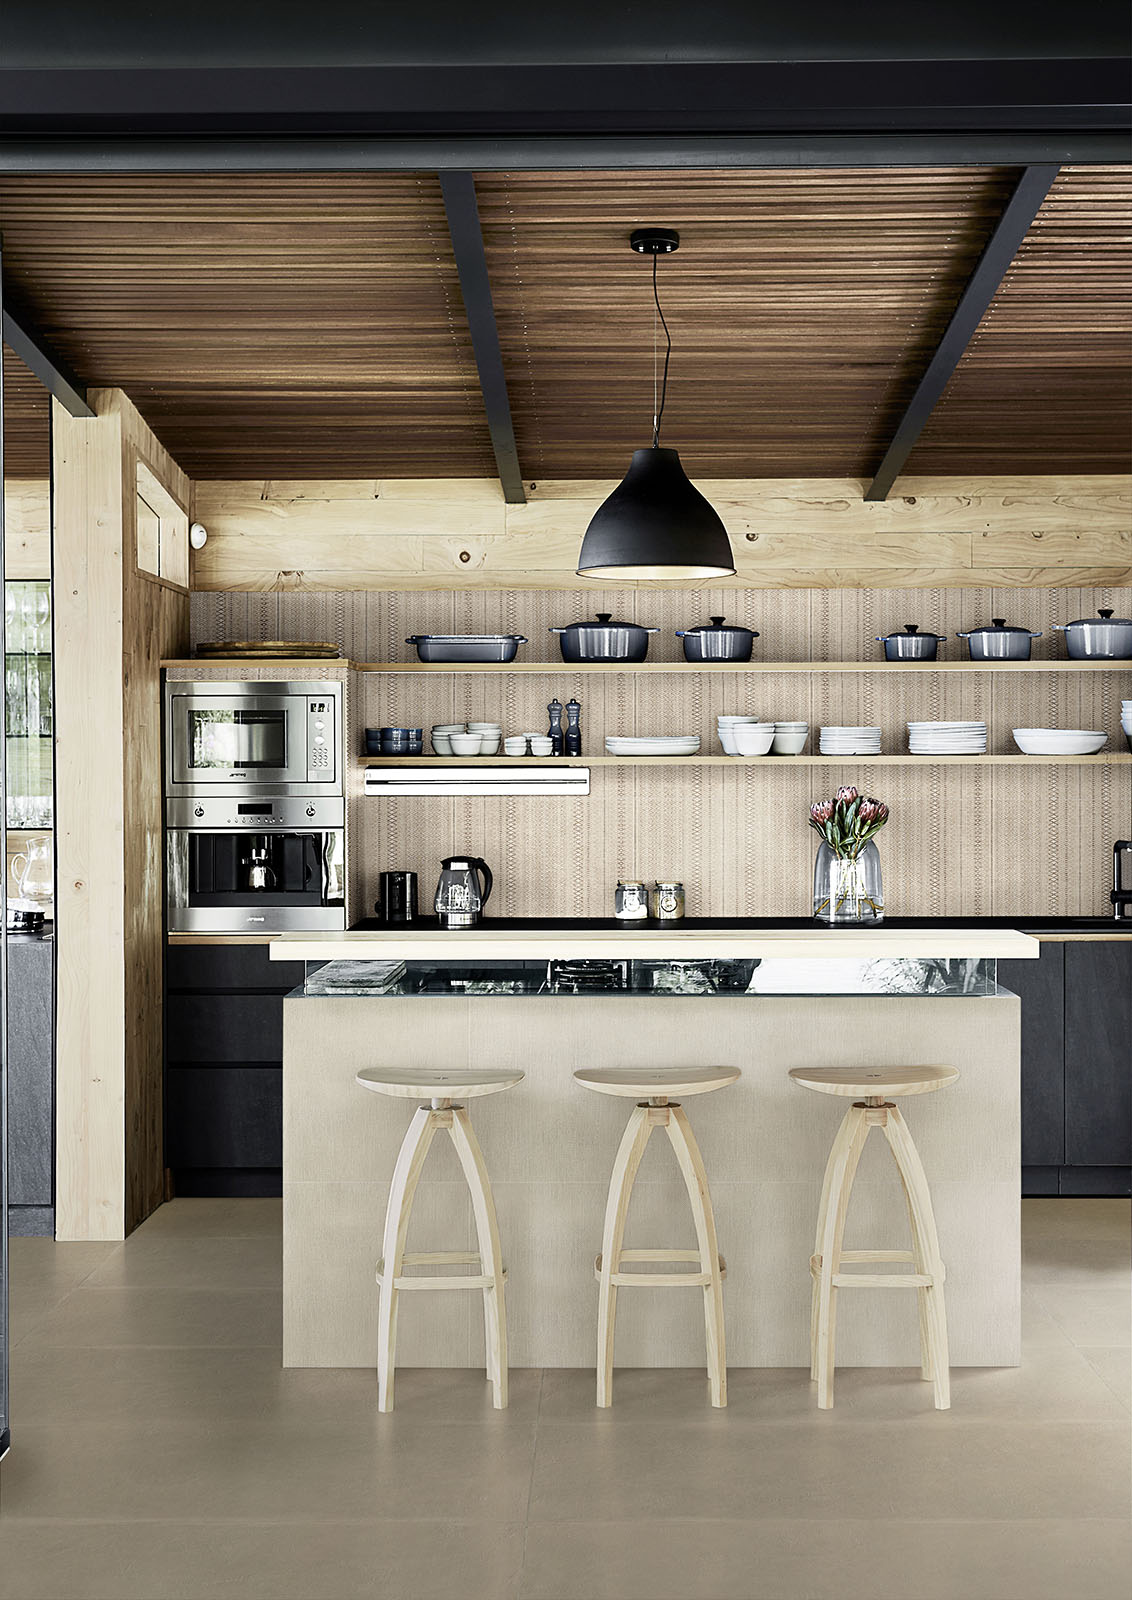 Piastrelle Marazzi Cucina : Piastrelle cucina idee in ceramica e gres marazzi